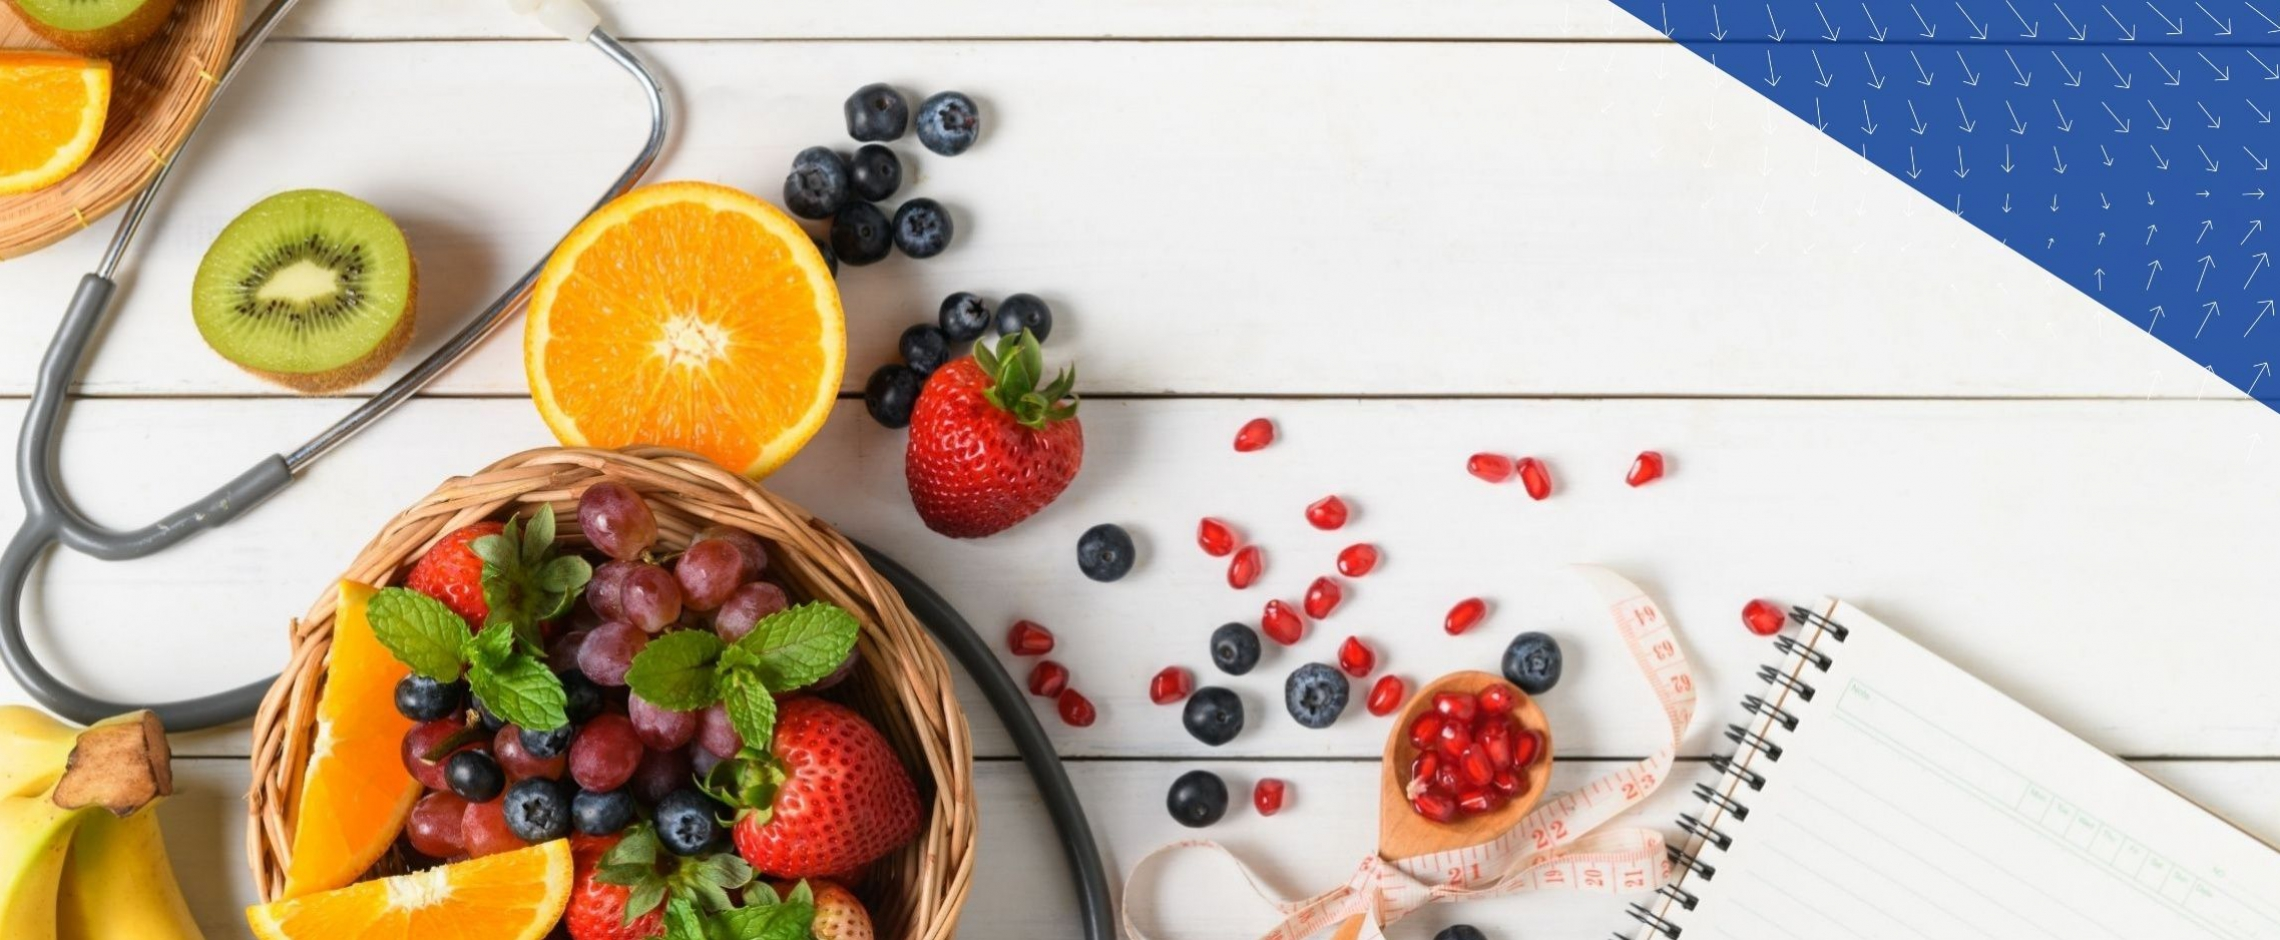 fruit salad and stethoscope